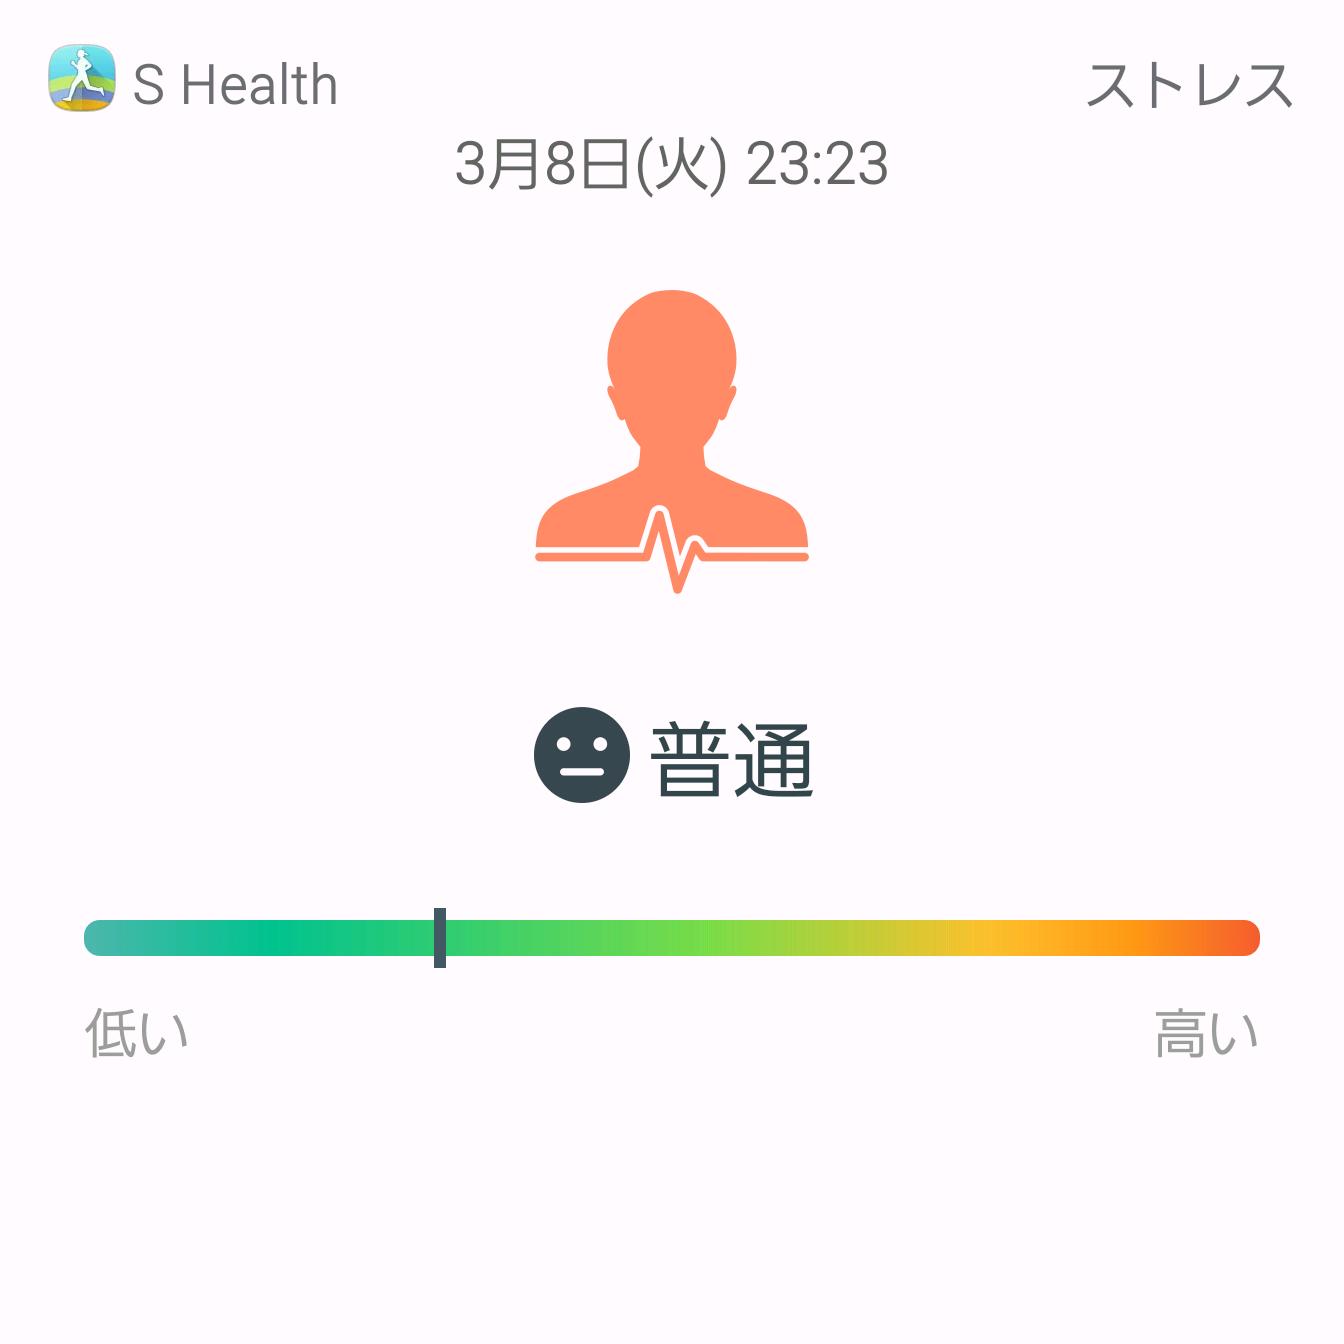 SHealth_23_24_35_440.png